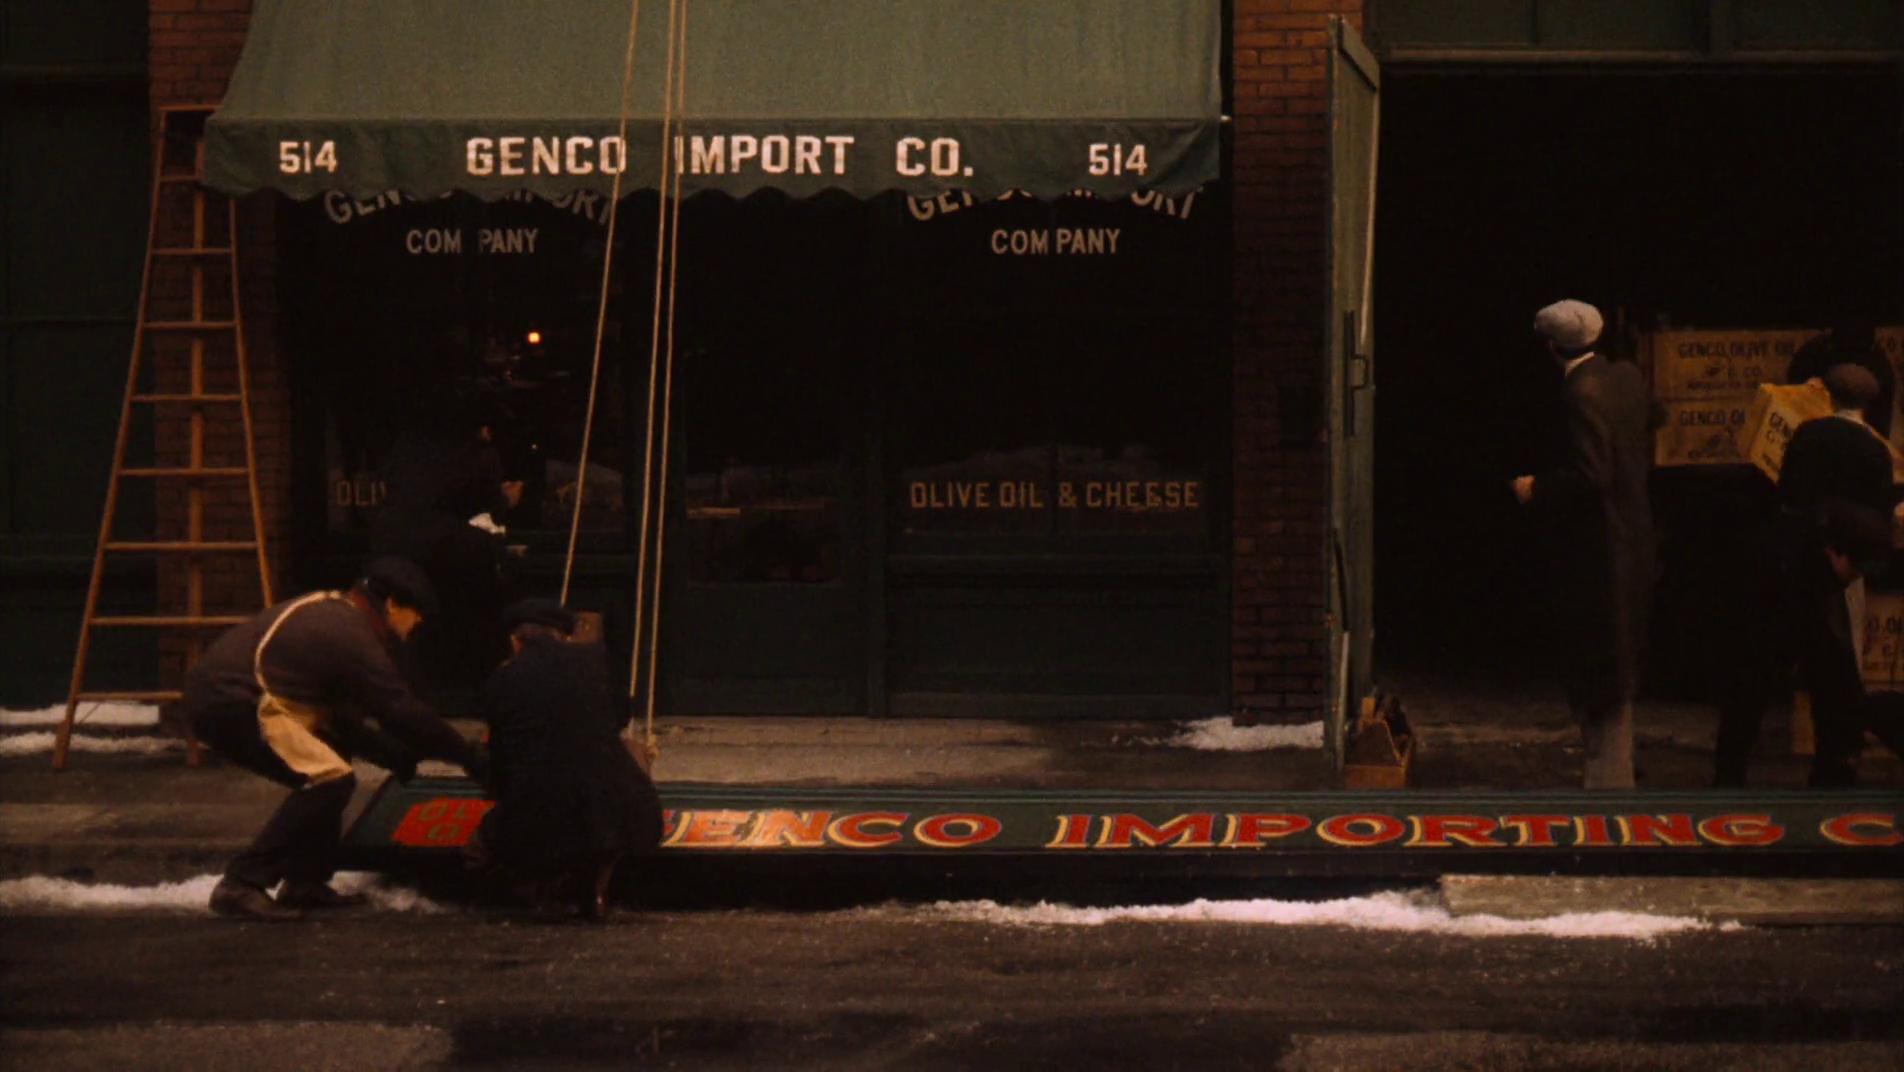 Genco Pura Olive Oil Company was a front company formed by Vito Corleone in the 1920s